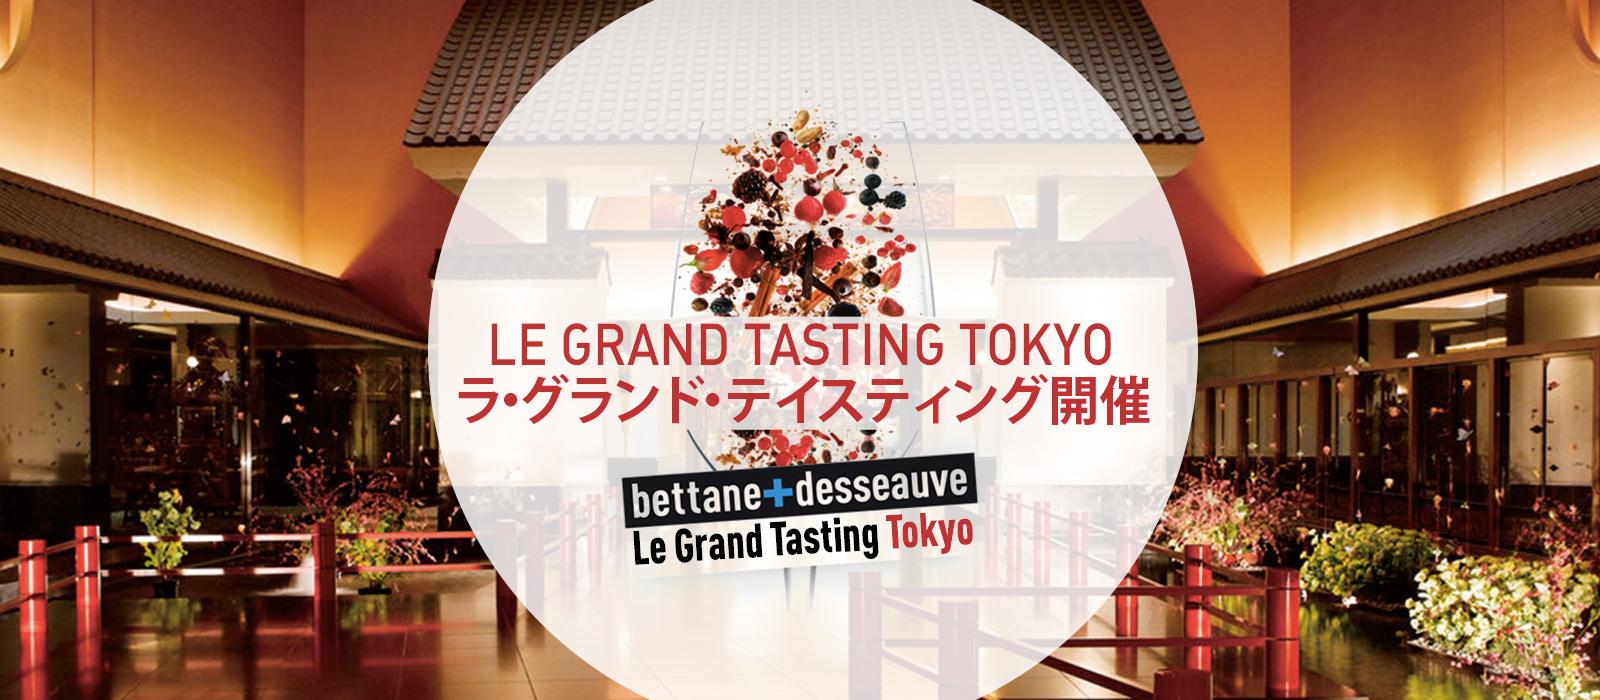 grand tasting tokyo